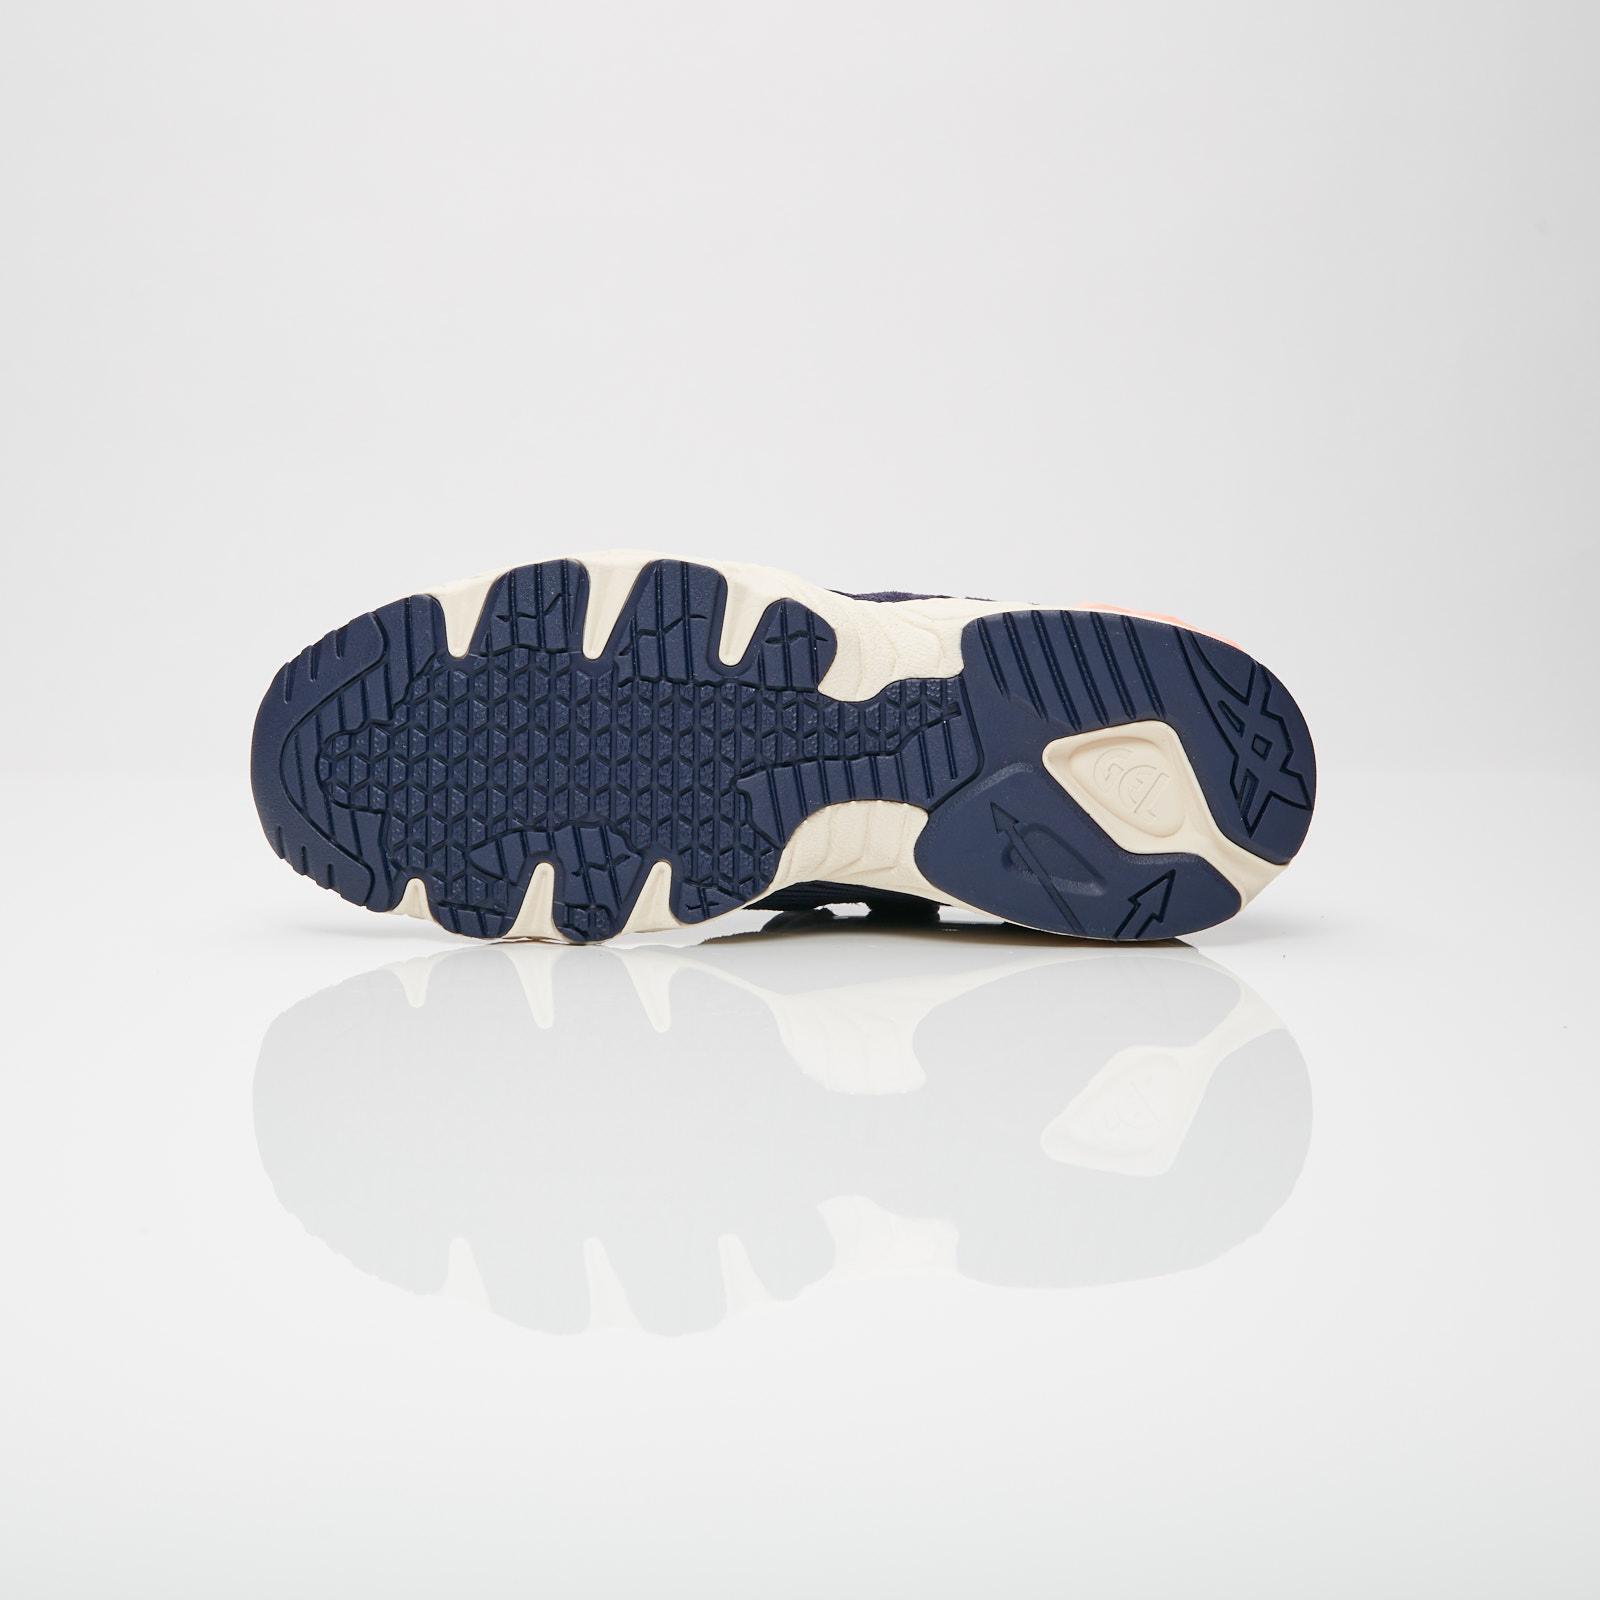 quality design aab83 15ba1 ASICS Tiger Gel-Mai - H8e3n-5858 - Sneakersnstuff   sneakers ...